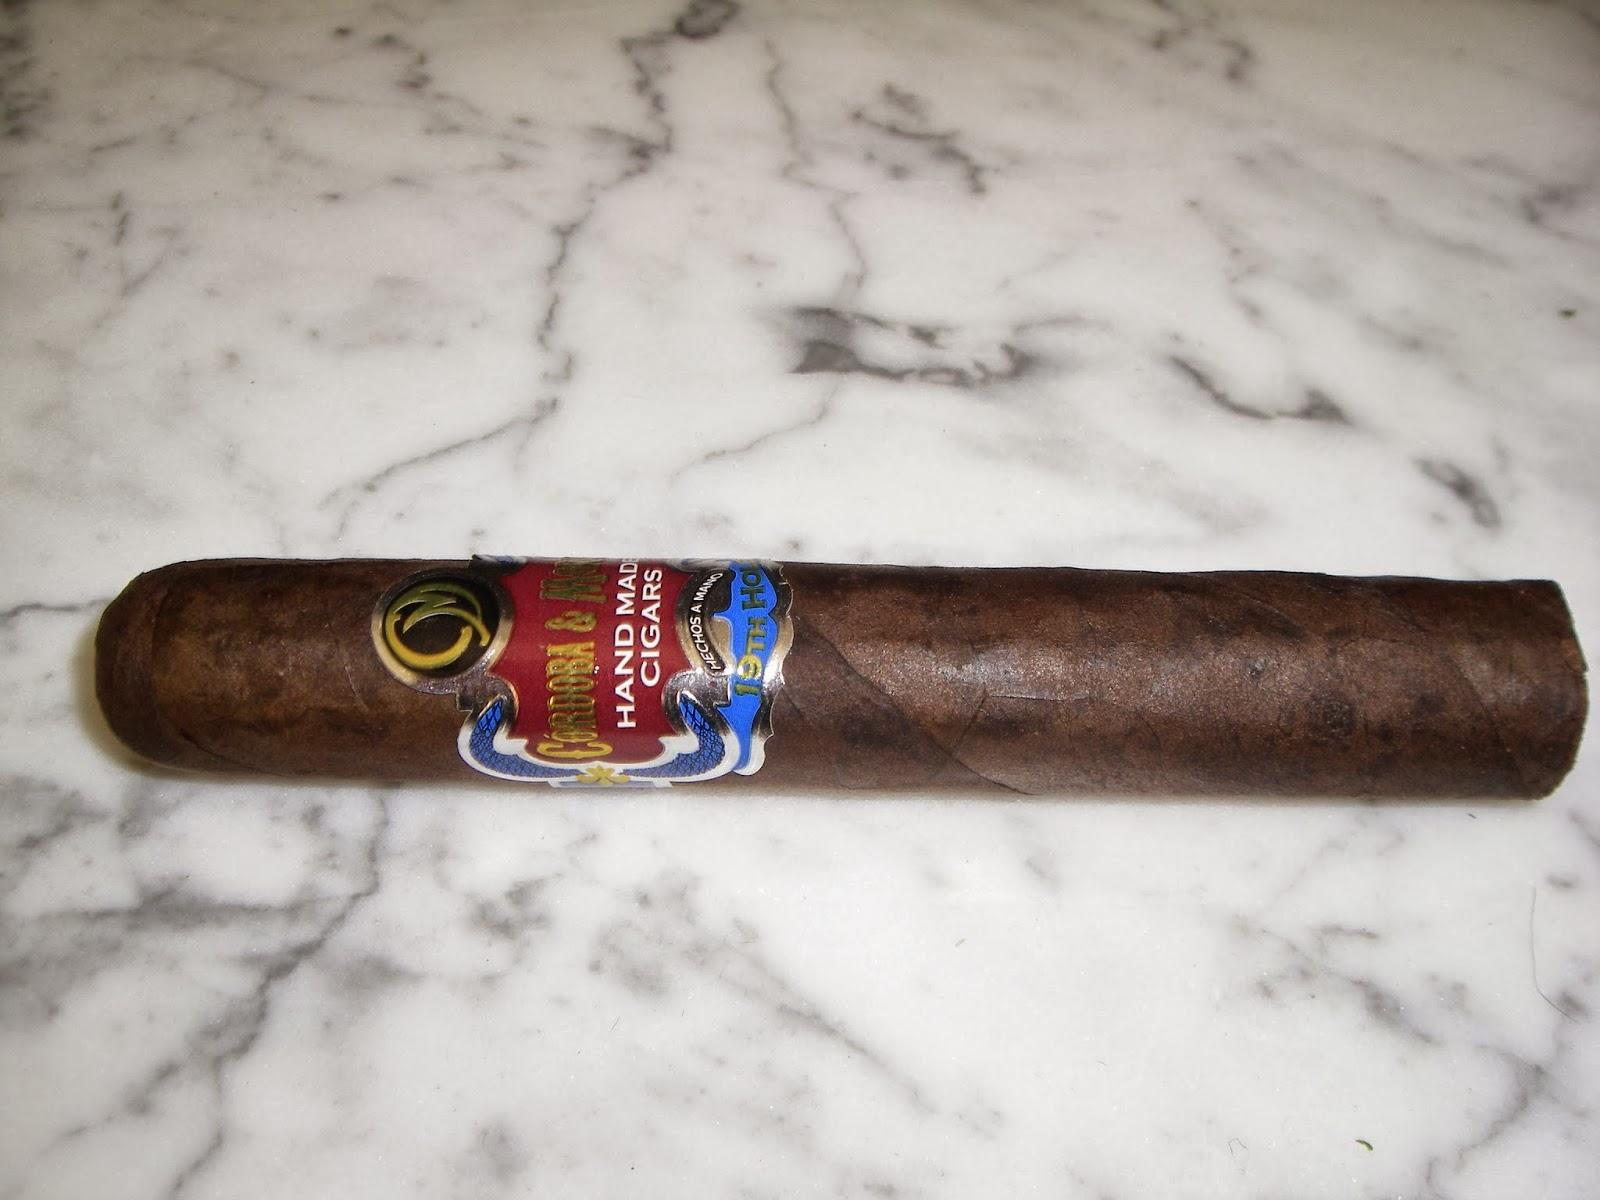 Cigar Review: Córdoba & Morales 19th Hole